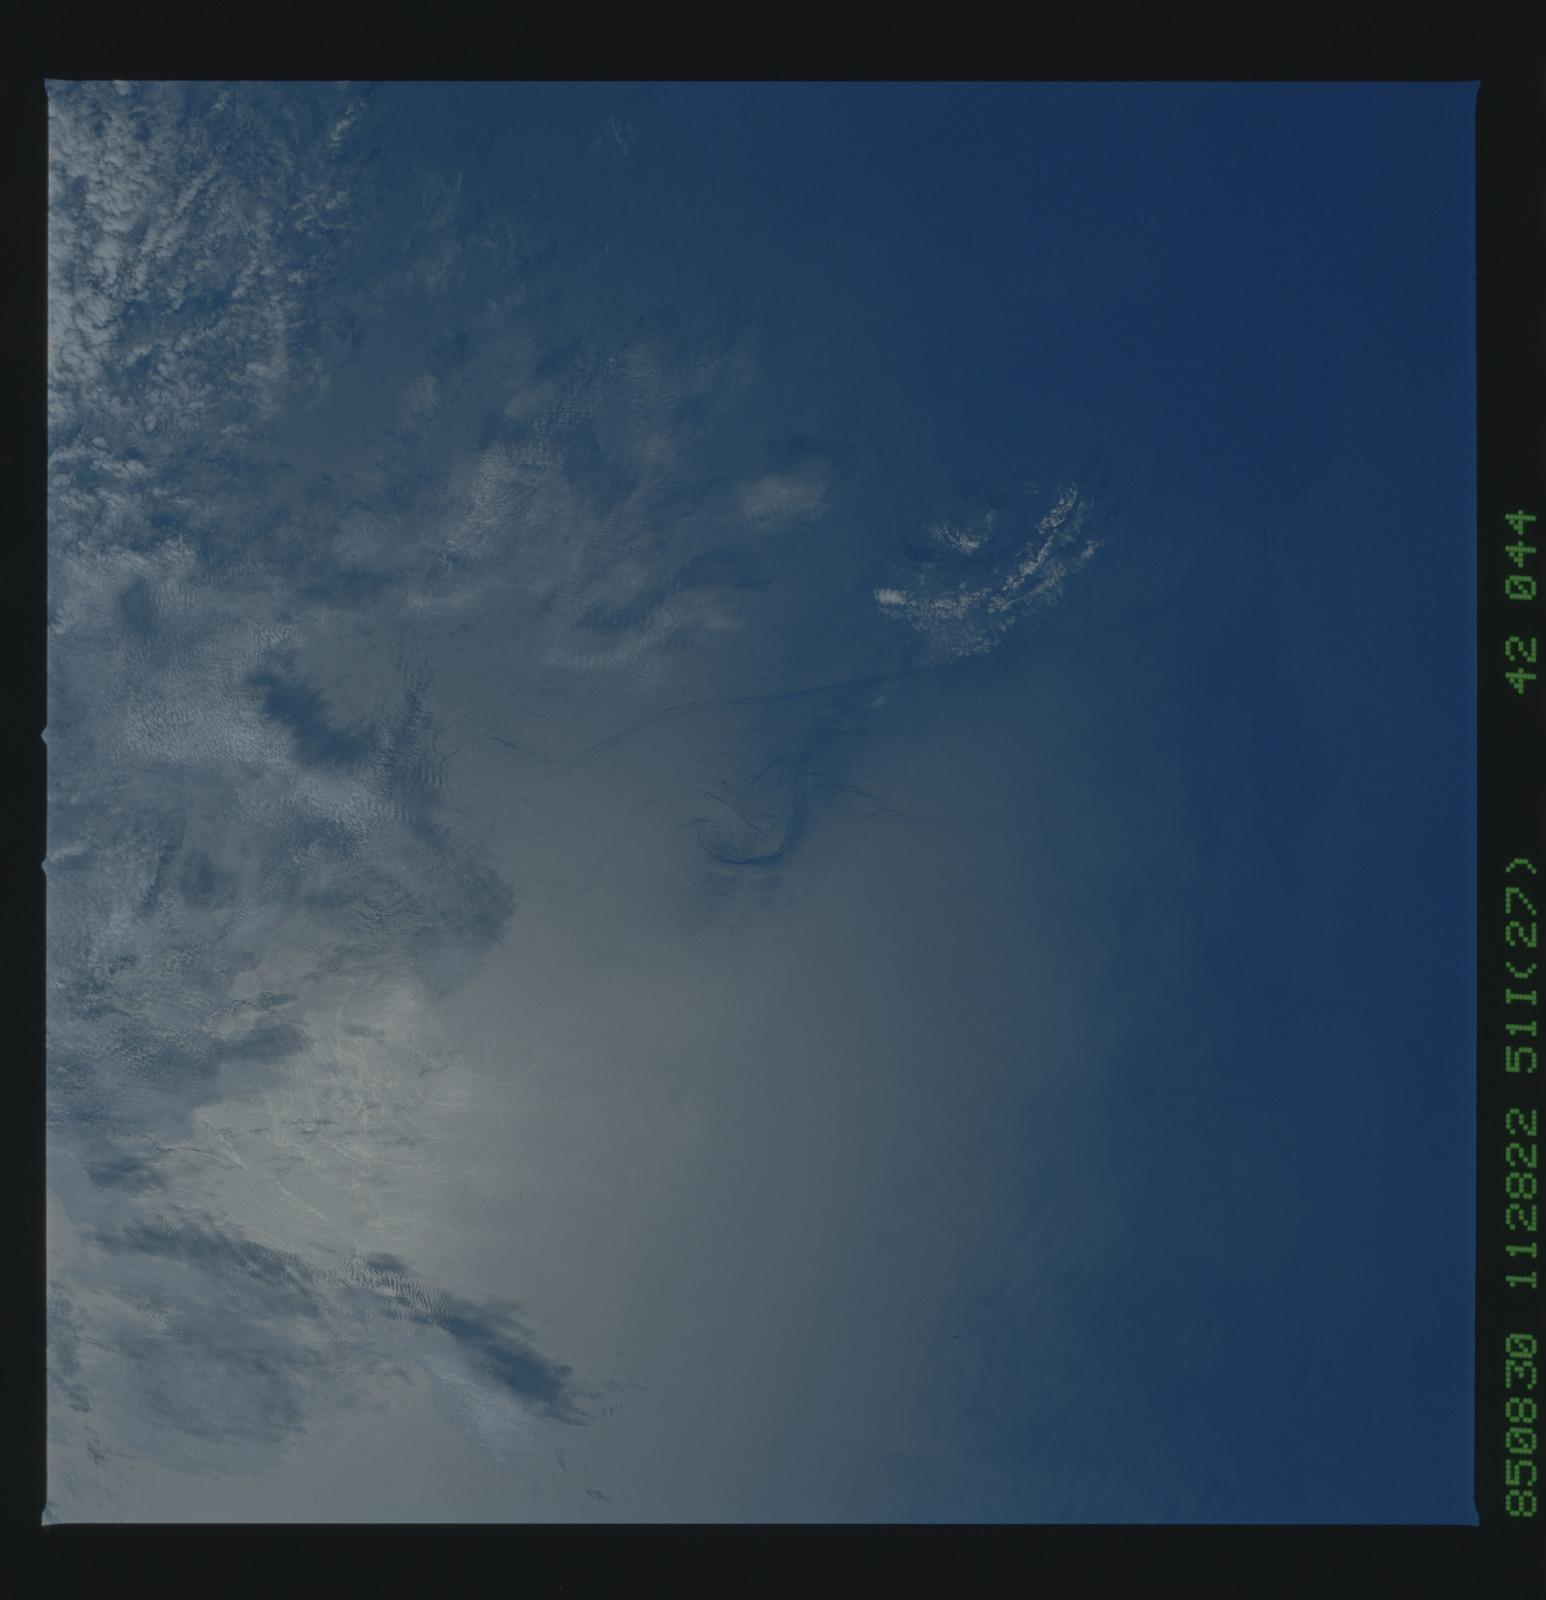 51I-42-044 - STS-51I - STS-51I earth observations